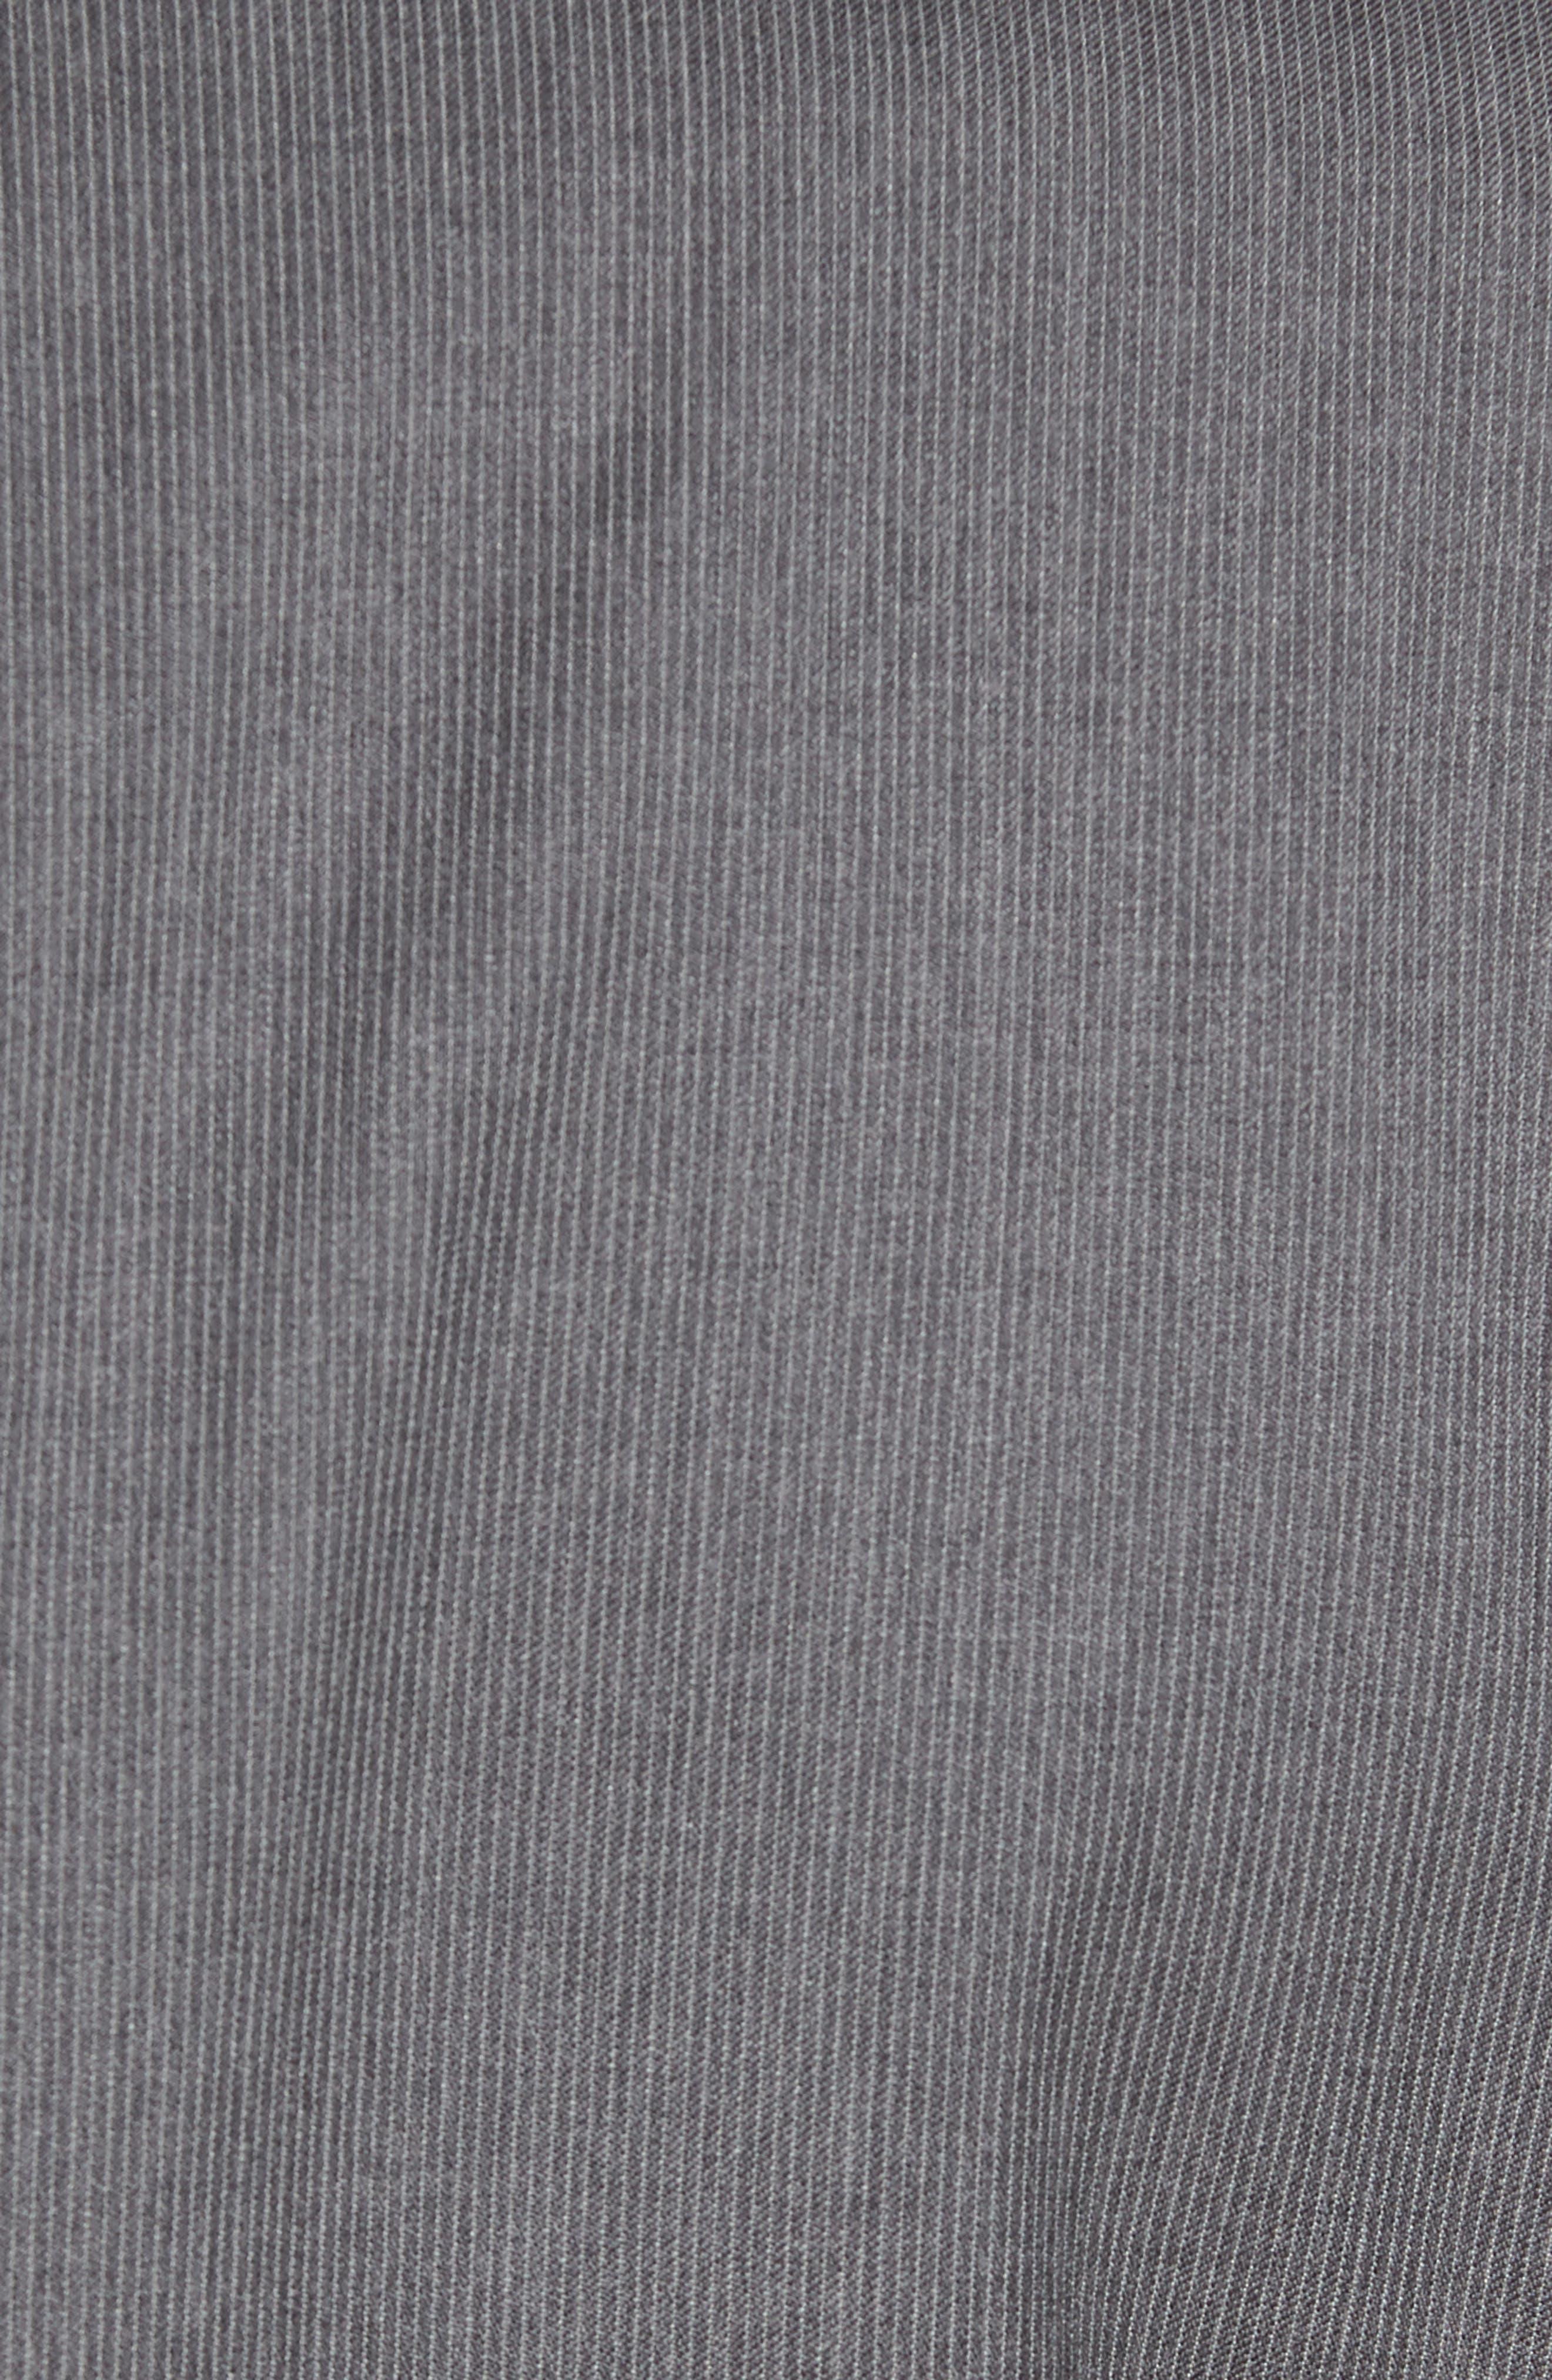 Ryan Classic Fit Stripe Wool Suit,                             Alternate thumbnail 7, color,                             030